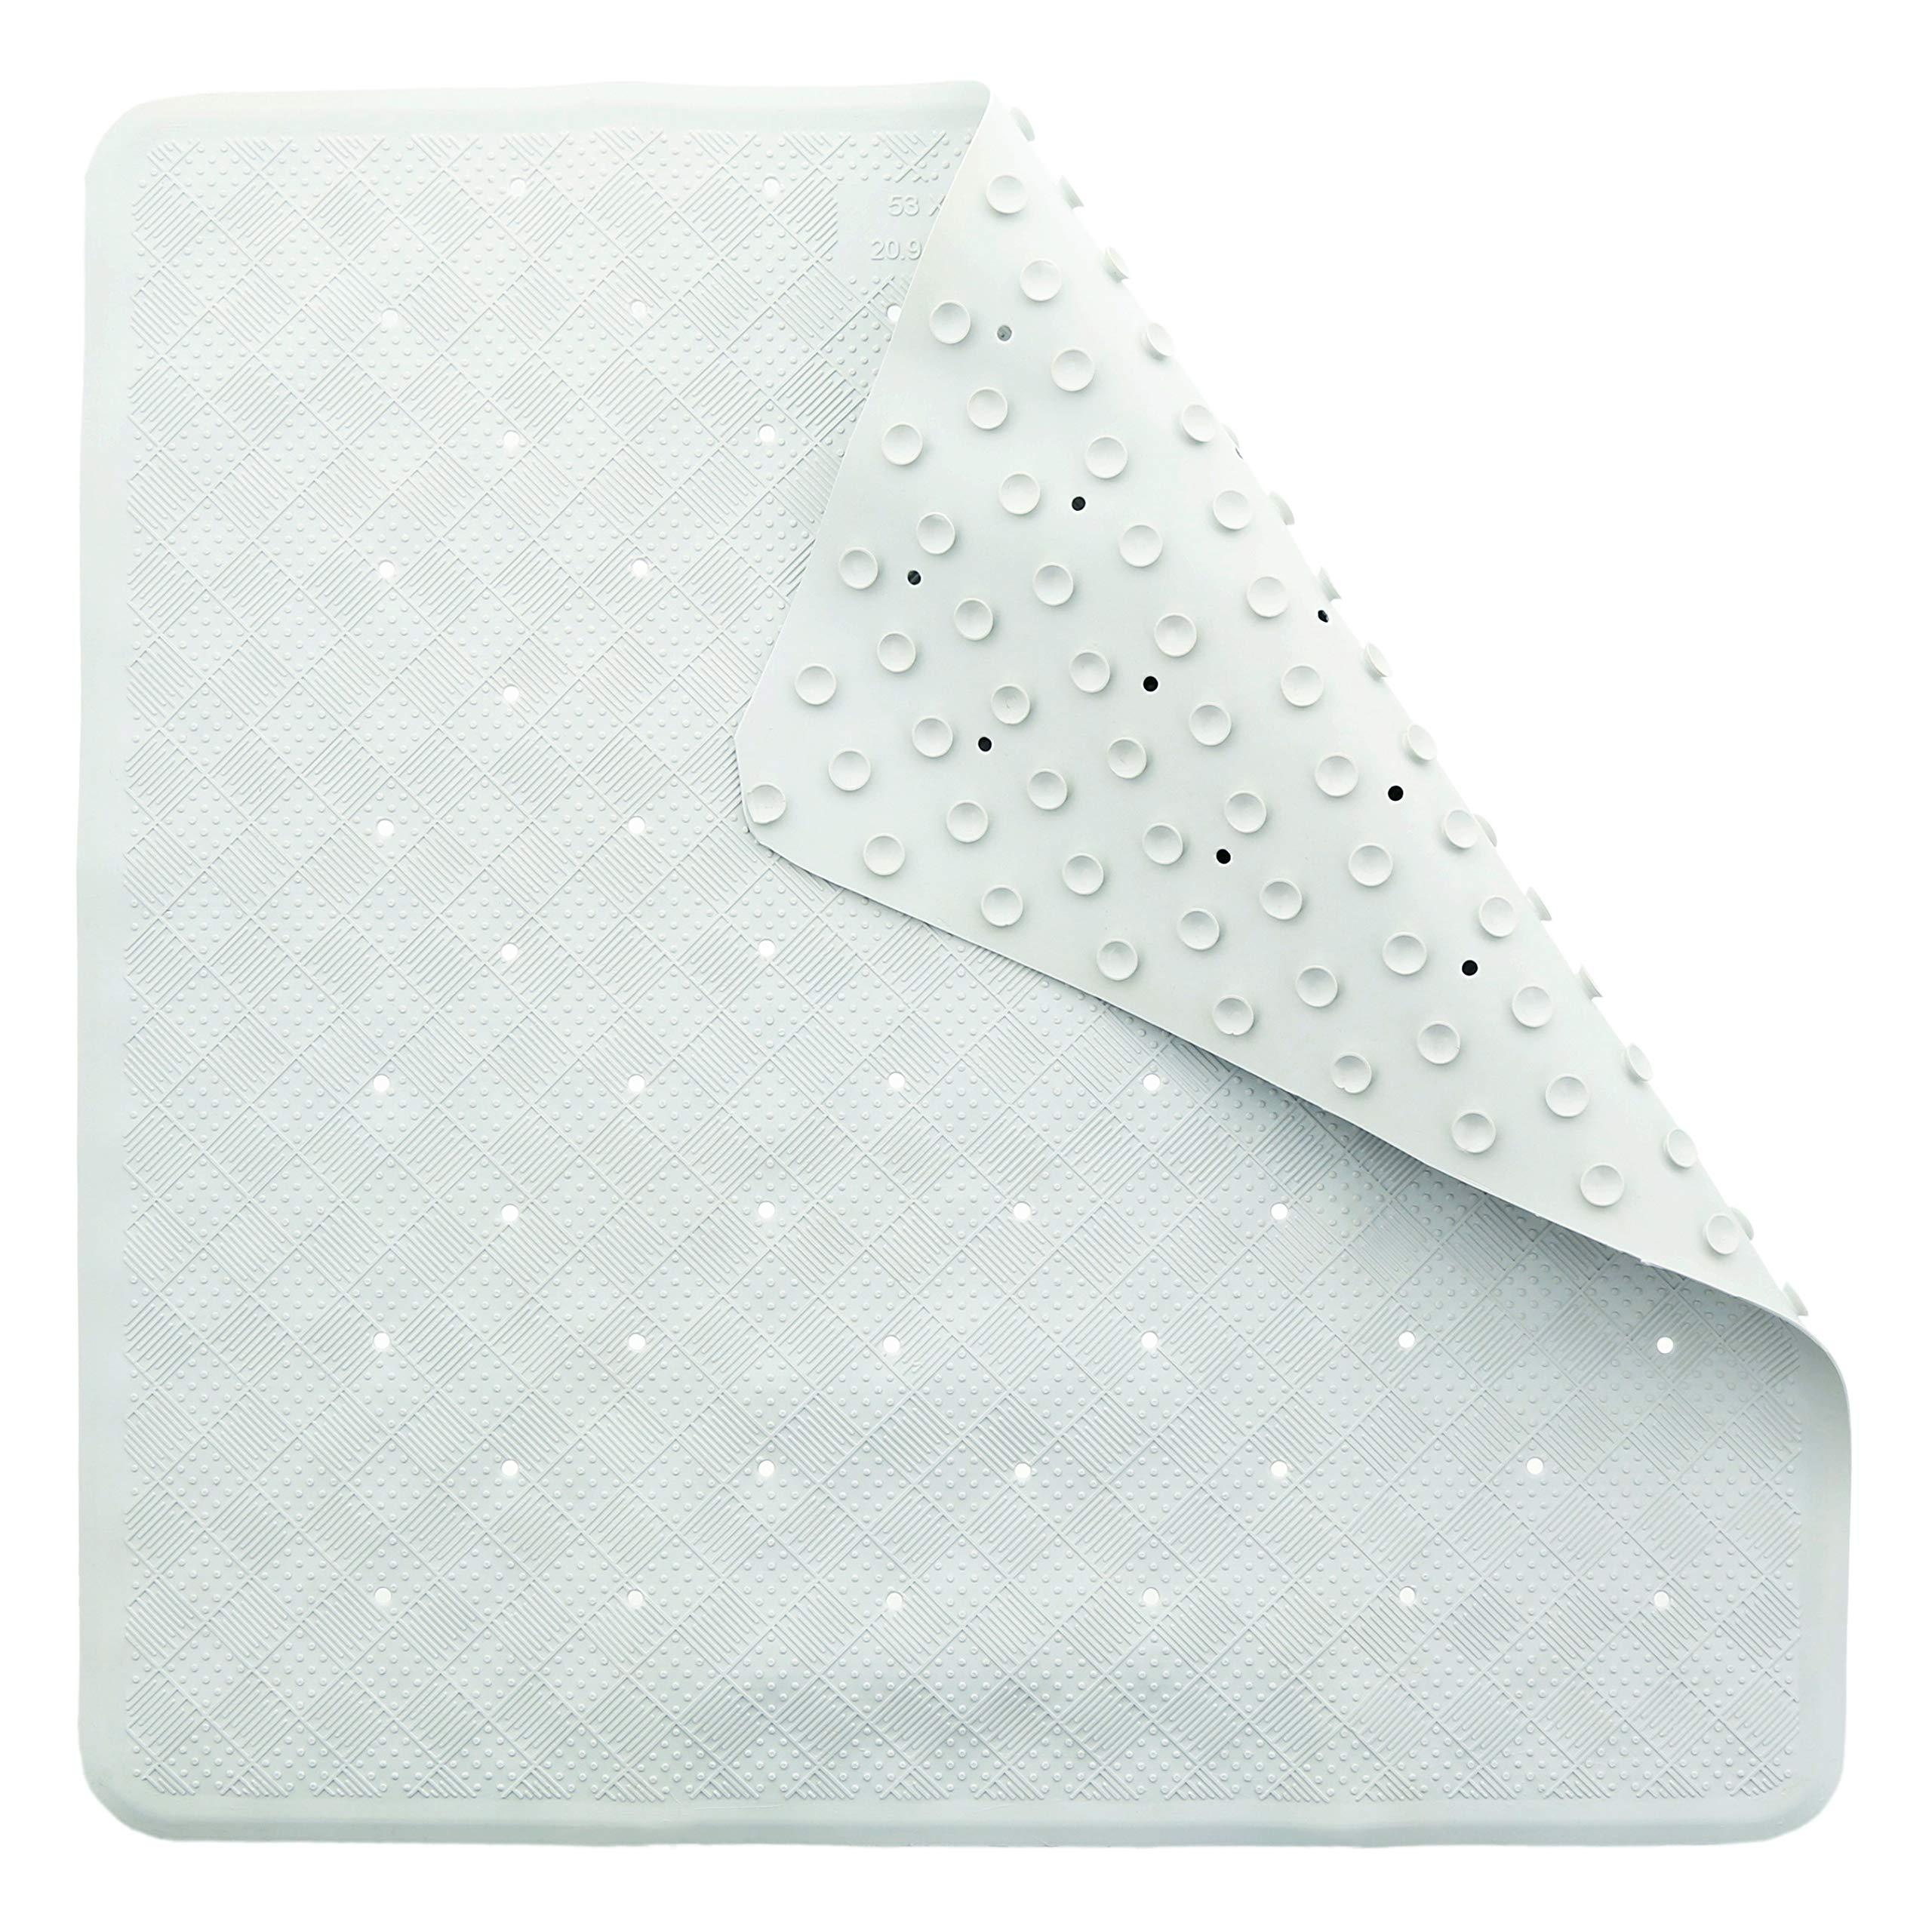 Bathsafe Anti-slip Square Pebbles Shower Mat Extra Large Anti-Bacterial Safety Bath Mat Suction Mat for Shower or Tub,Non-slip Bathtub Mat,54x54CM,Blue